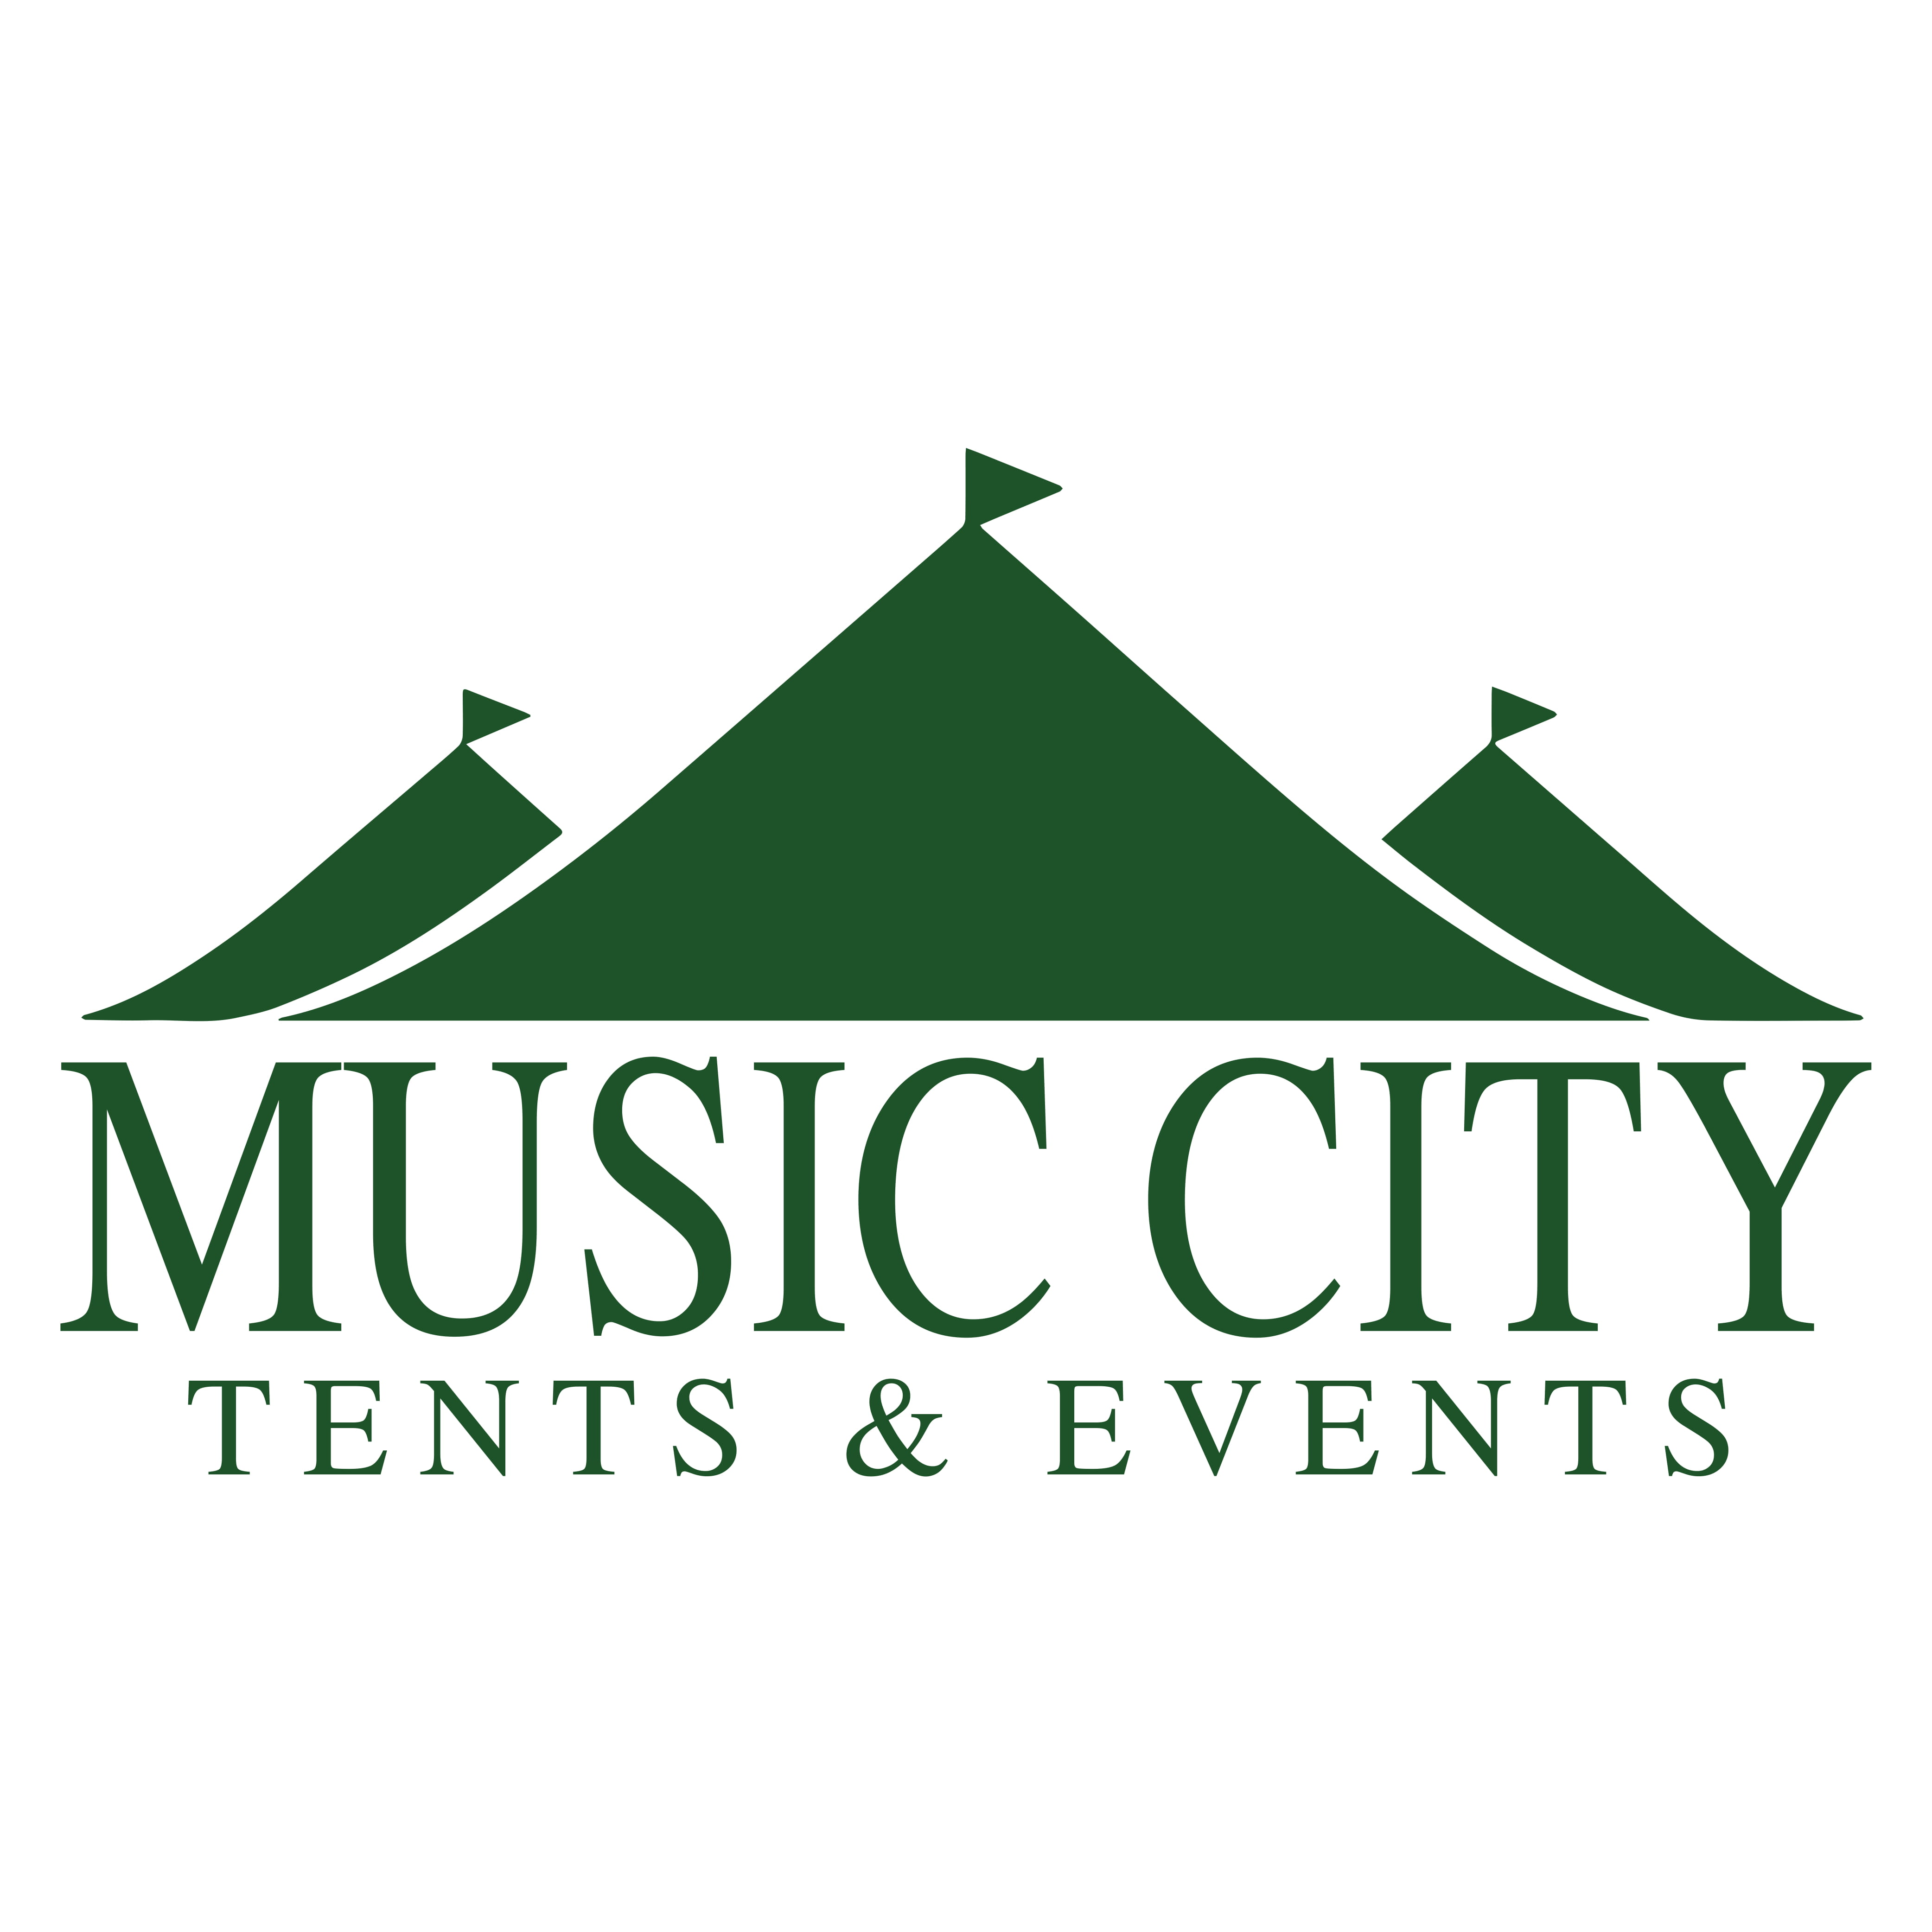 Music City Tents logo